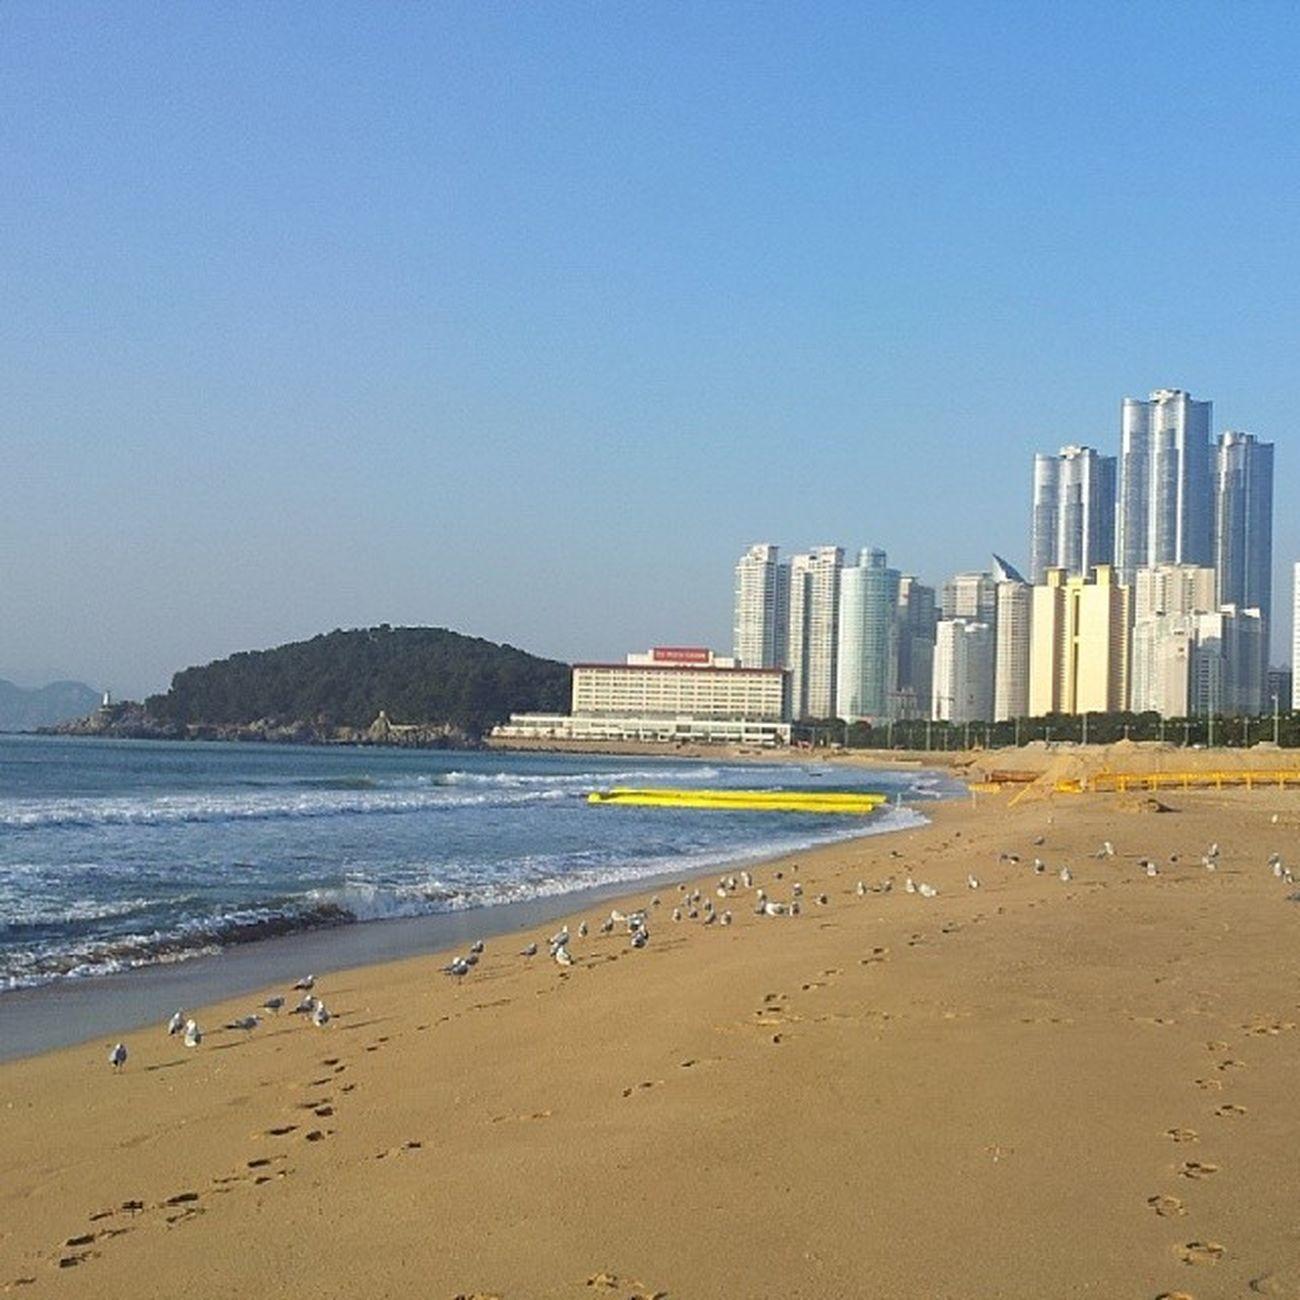 beach view in busan Busan Haeundae Beach Beautiful nofilter